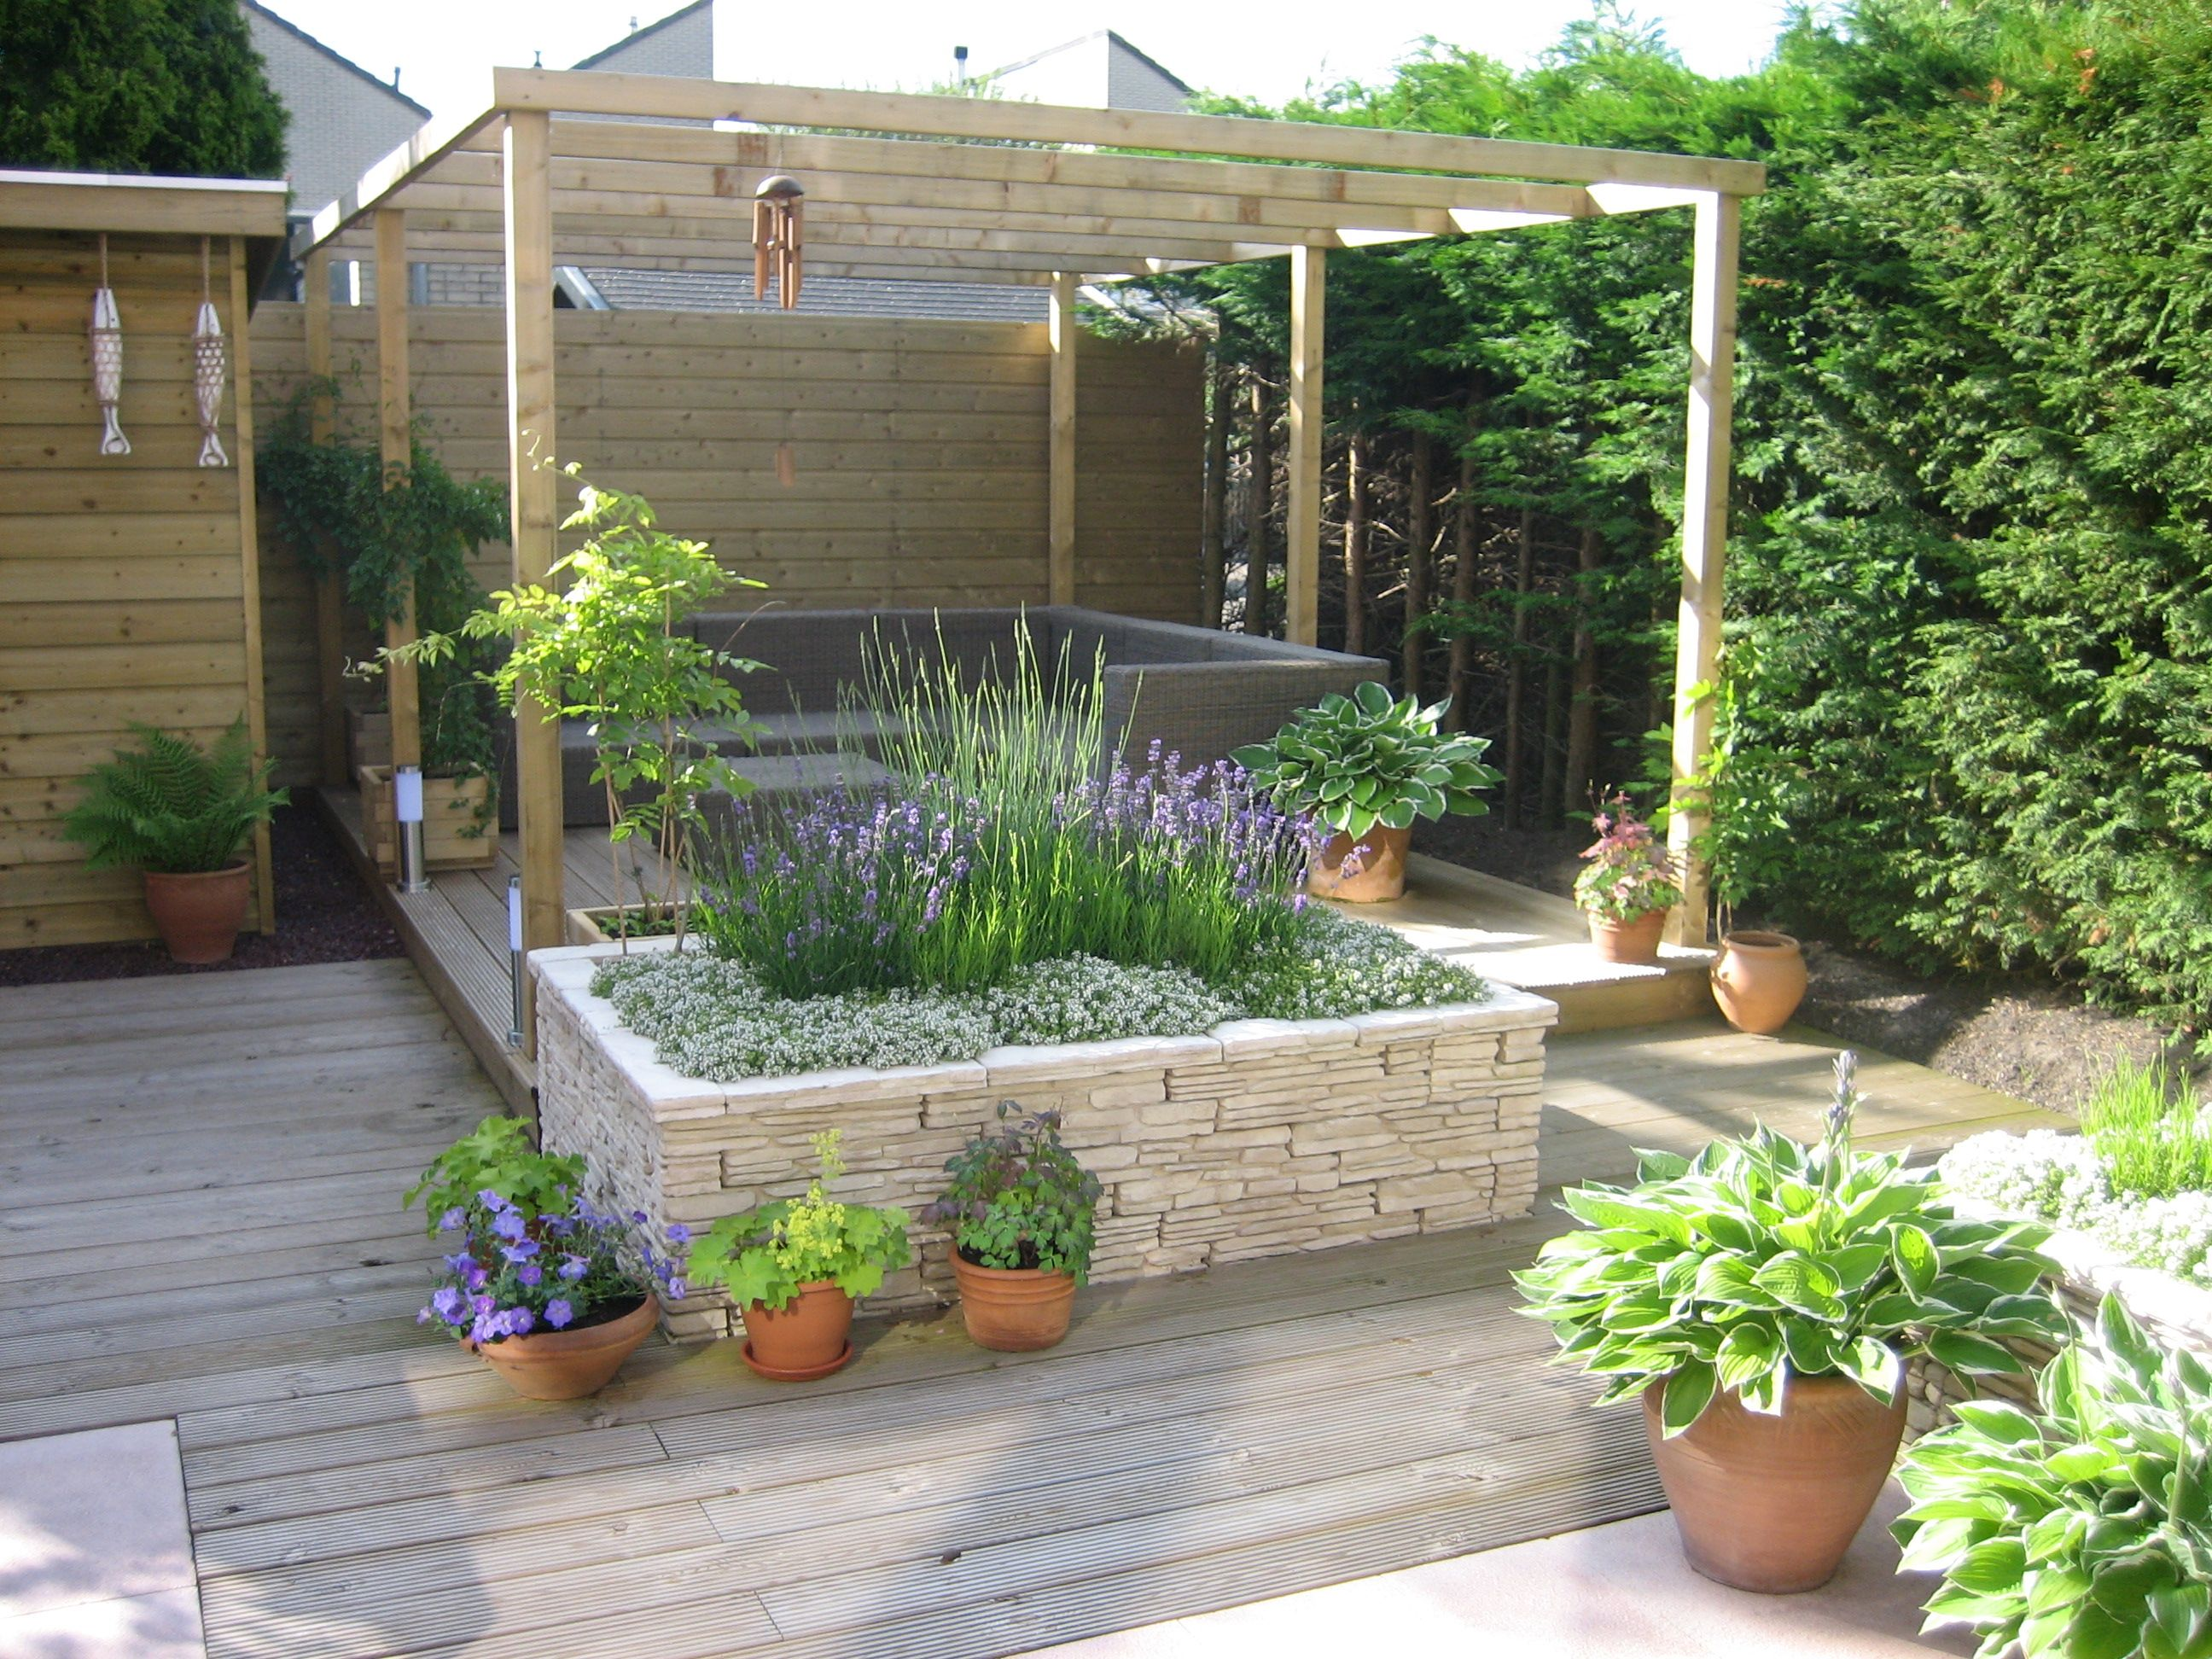 Tuin met houten vlonder garden pinterest gardens pergolas and garden ideas - Terras houten pergola ...